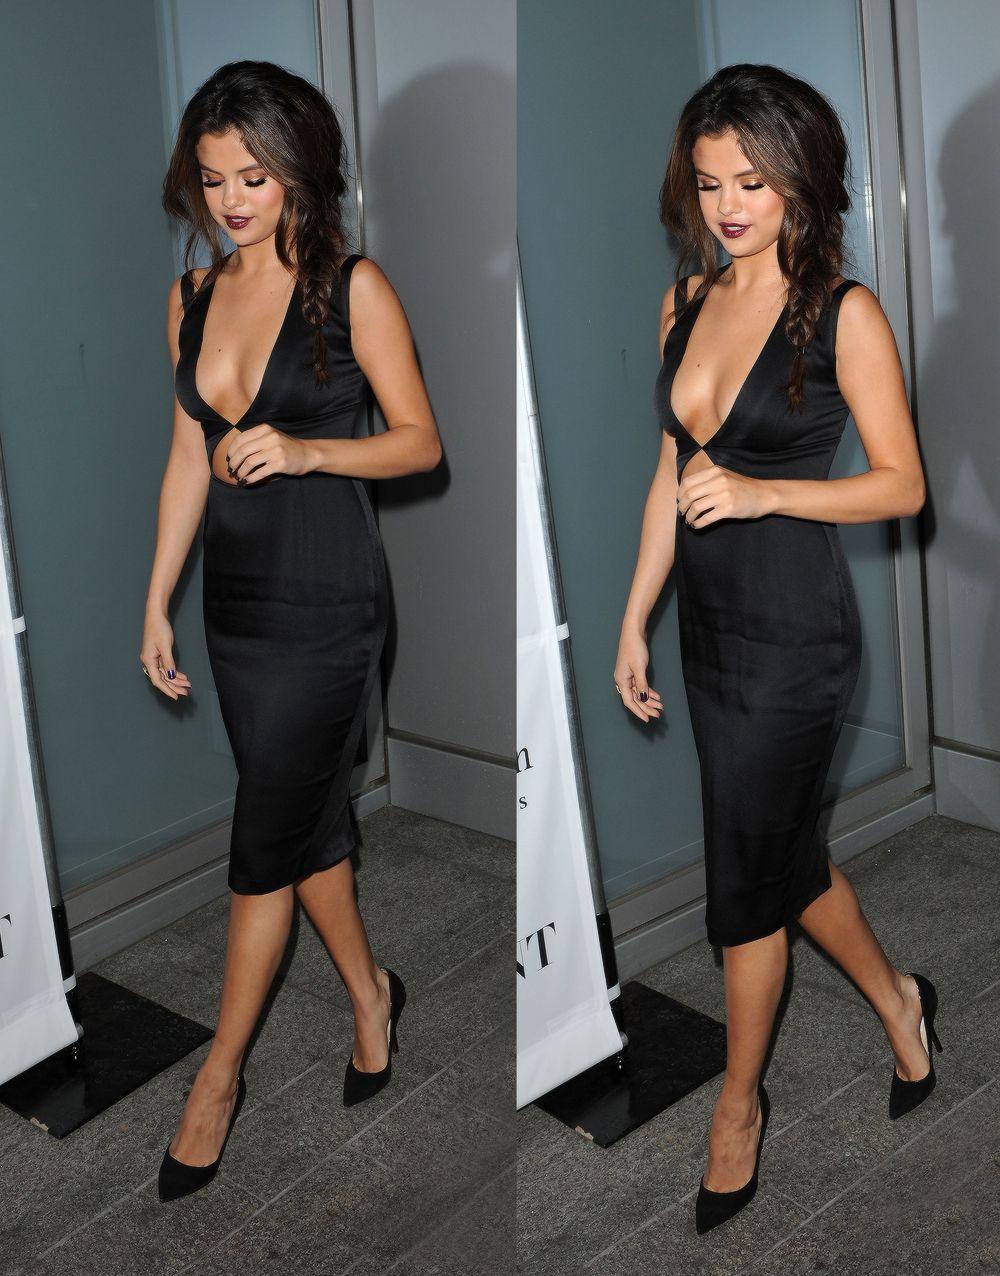 How Selena Gomez, Kate Hudson, and More Get Rid of Dark Circles How Selena Gomez, Kate Hudson, and More Get Rid of Dark Circles new pics